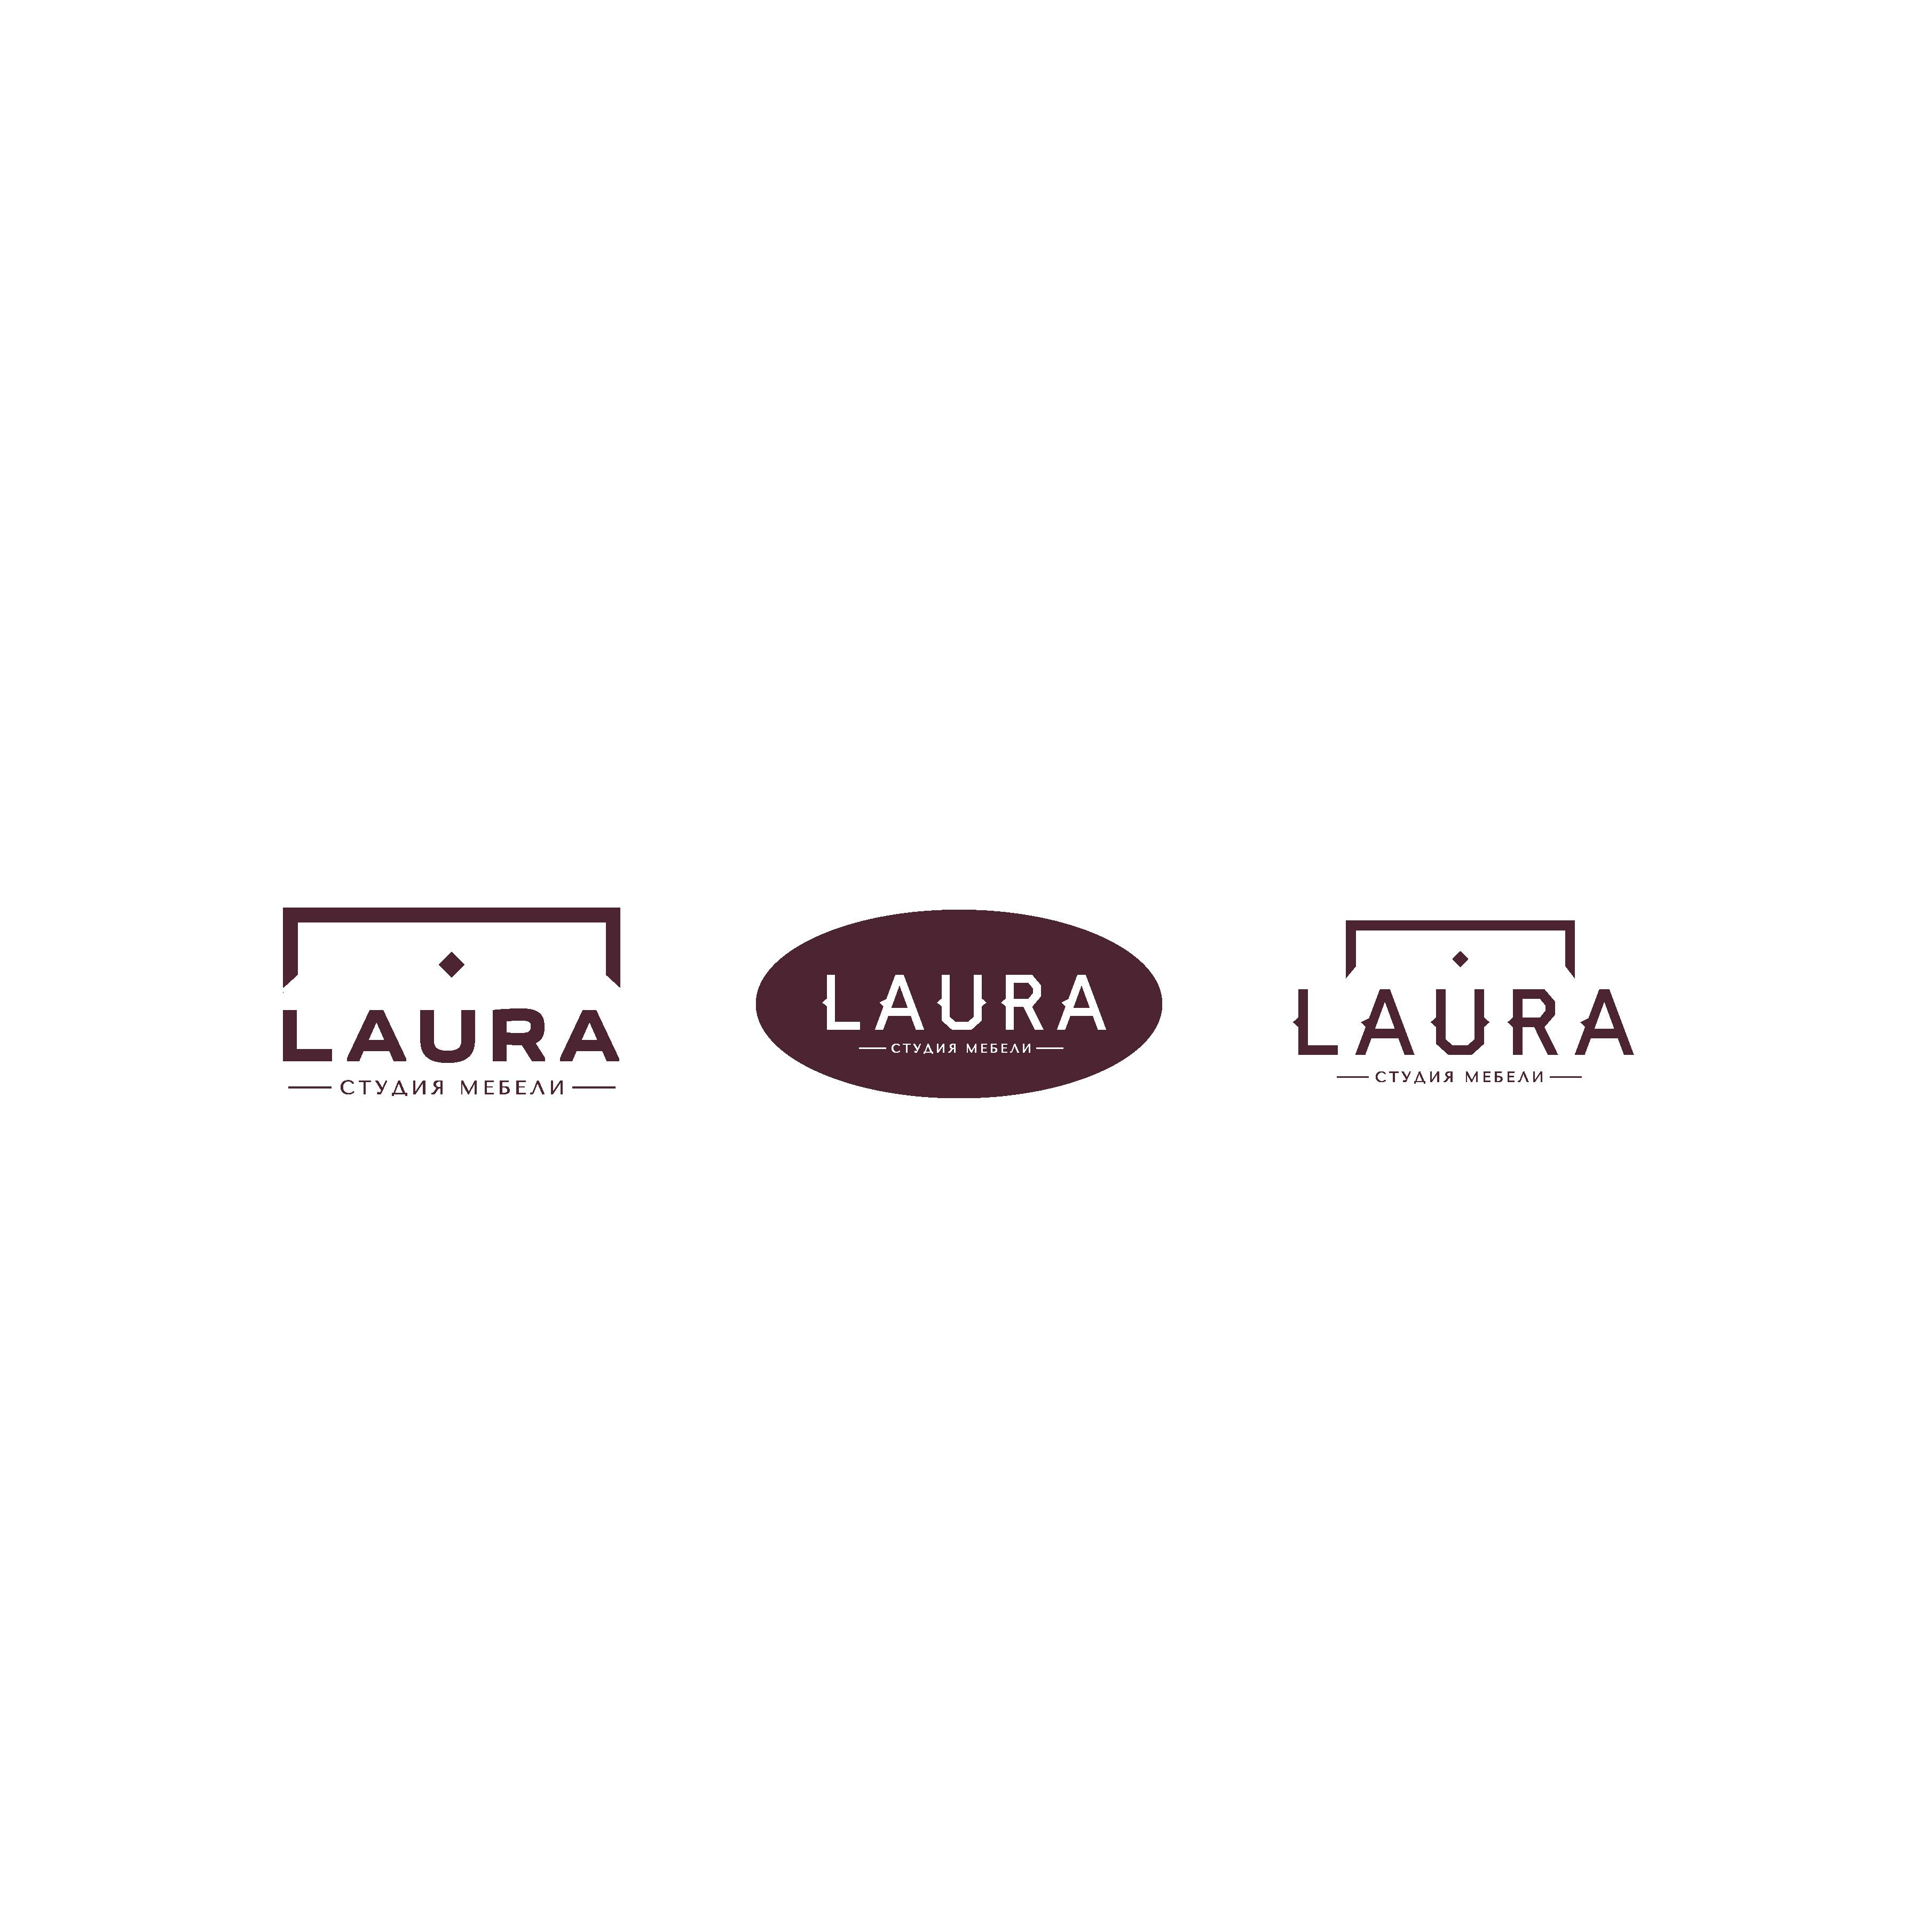 Разработать логотип для фабрики мебели фото f_38559b7889bd73f0.jpg